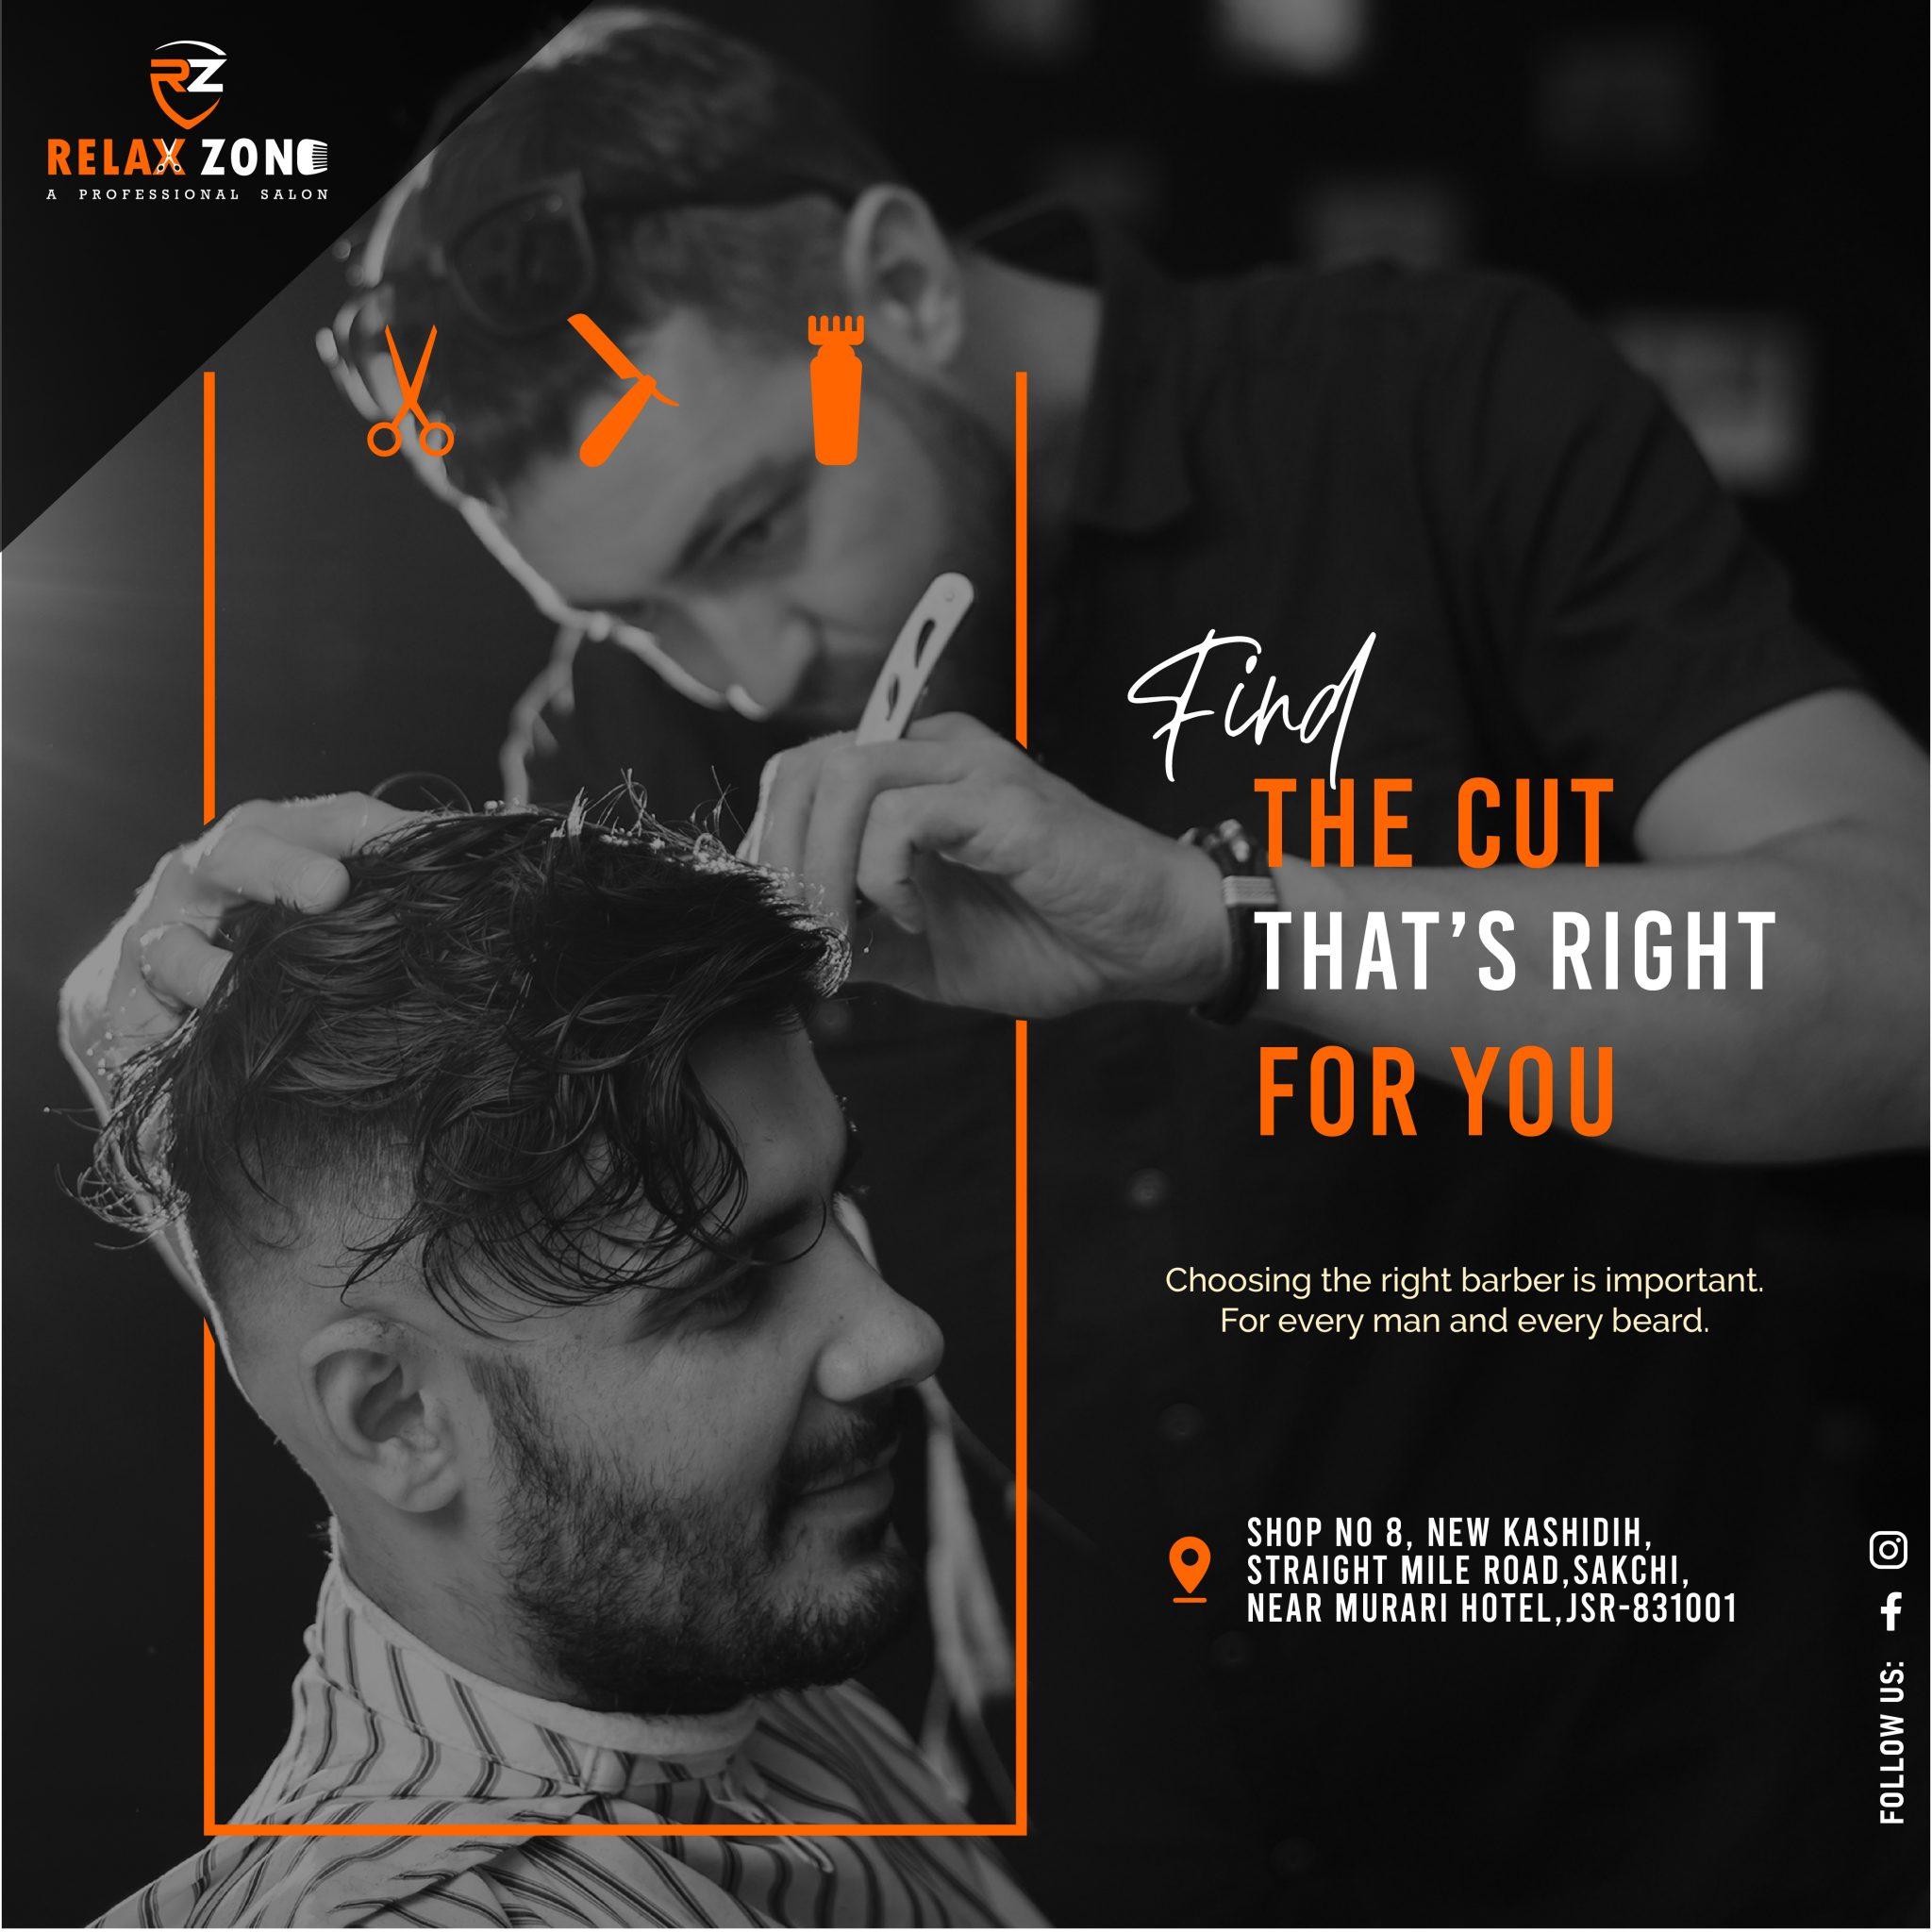 Salon Marketing and Branding